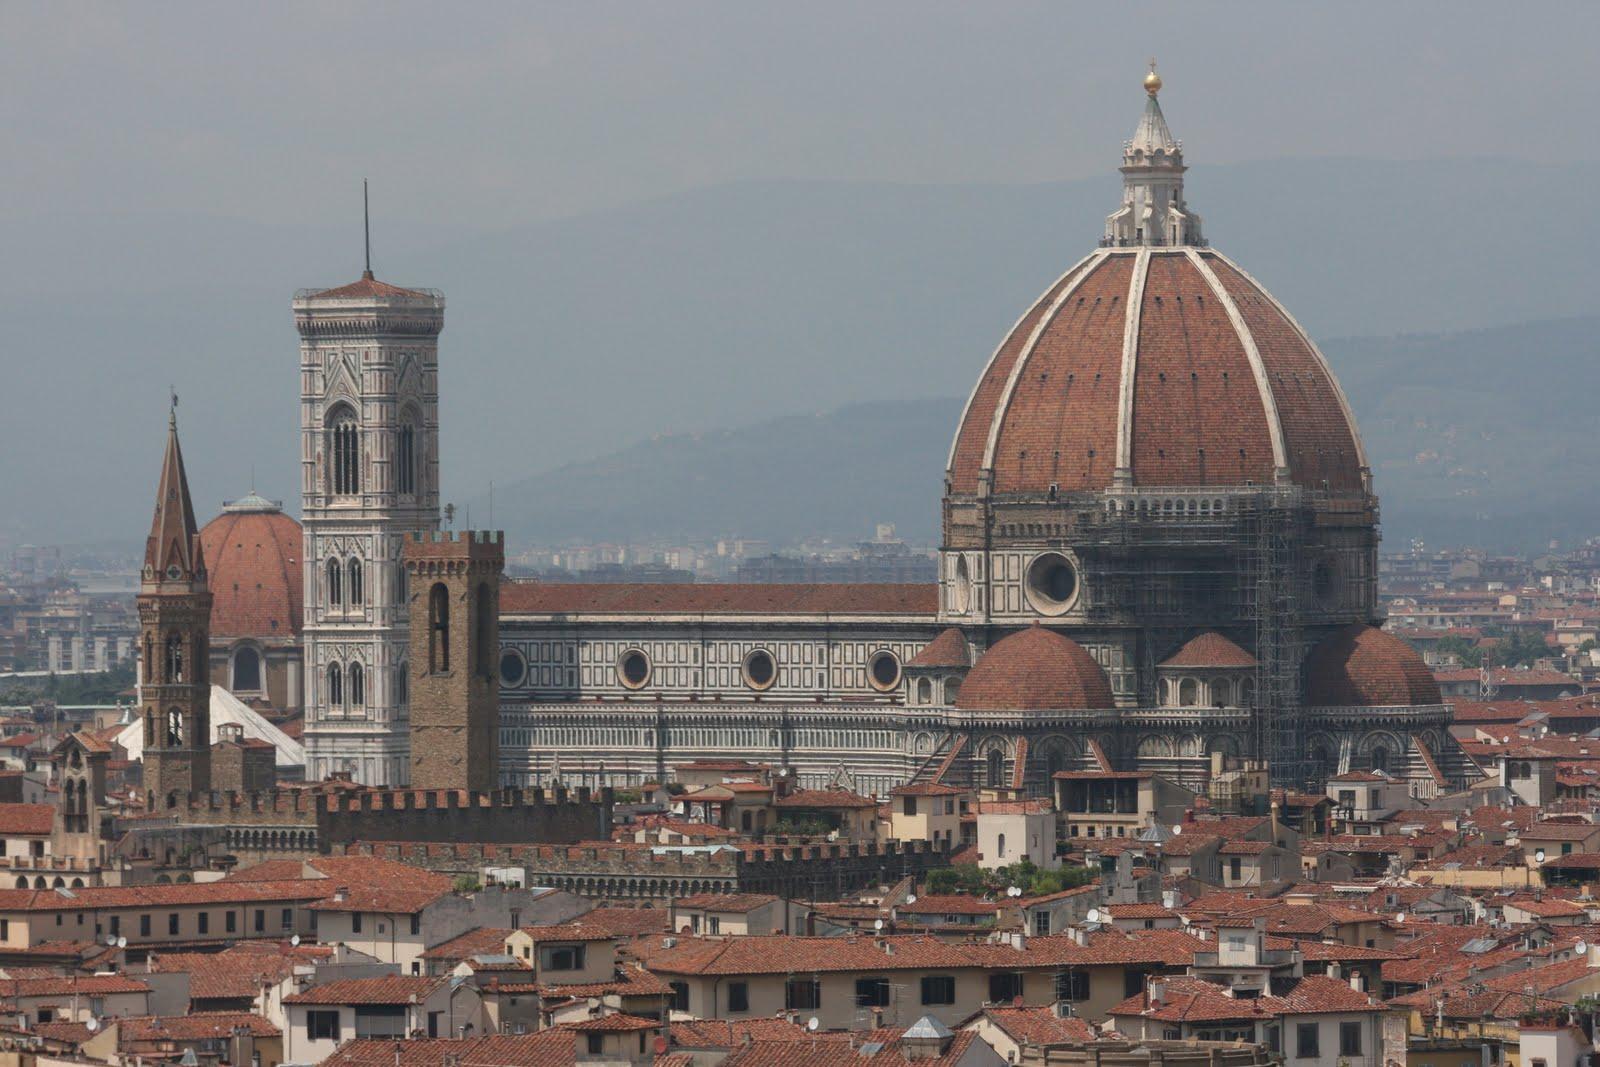 Florence Dome: Counterlight's Peculiars: Renaissance Saint Peter's